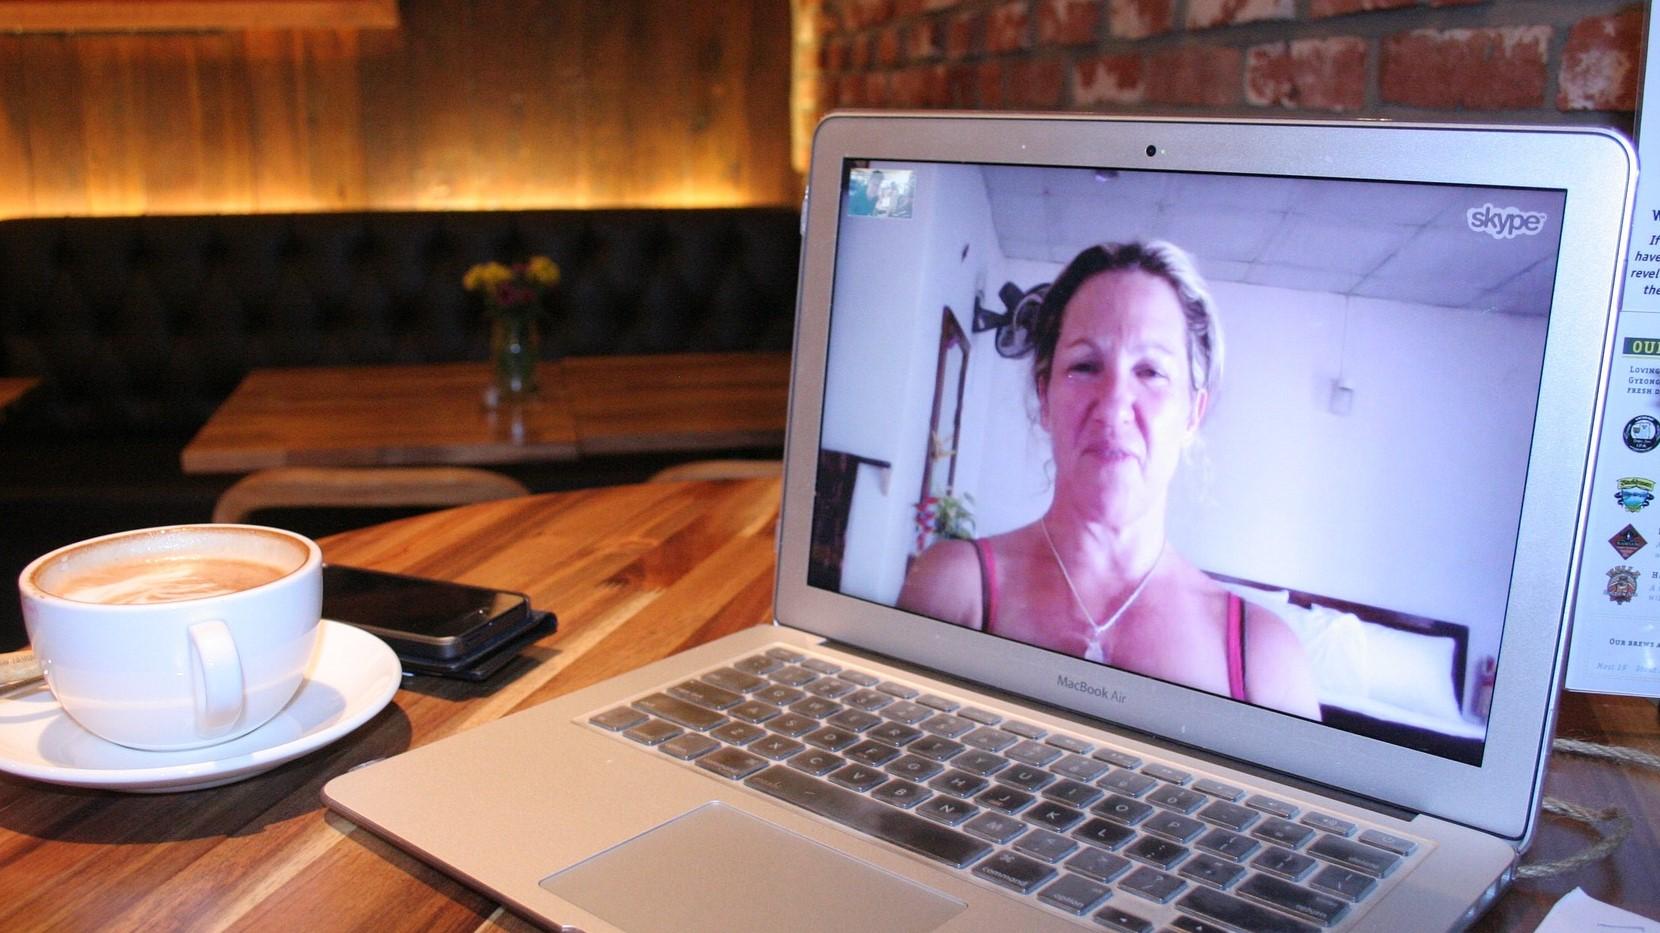 Skype on a laptop